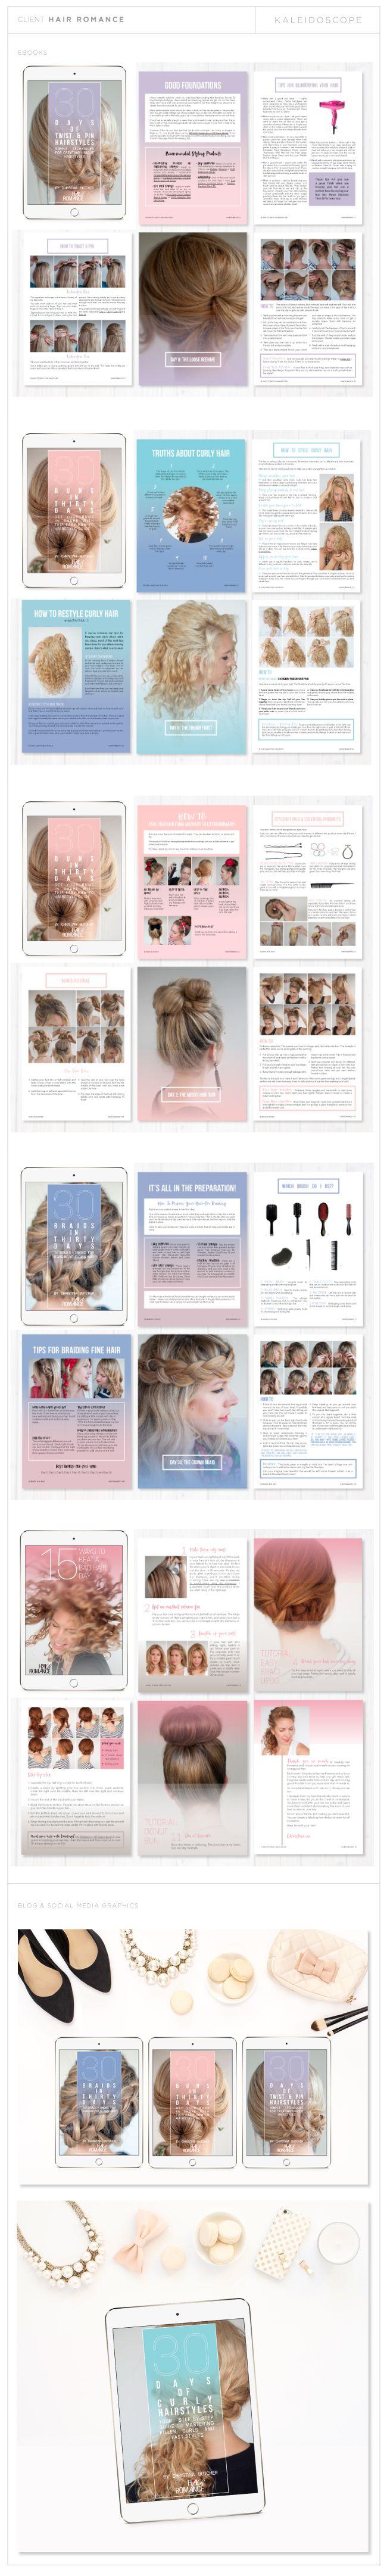 Hair Romance Ebook Graphic Design By Amanda Fuller Of Kaleidoscope Design  Studio